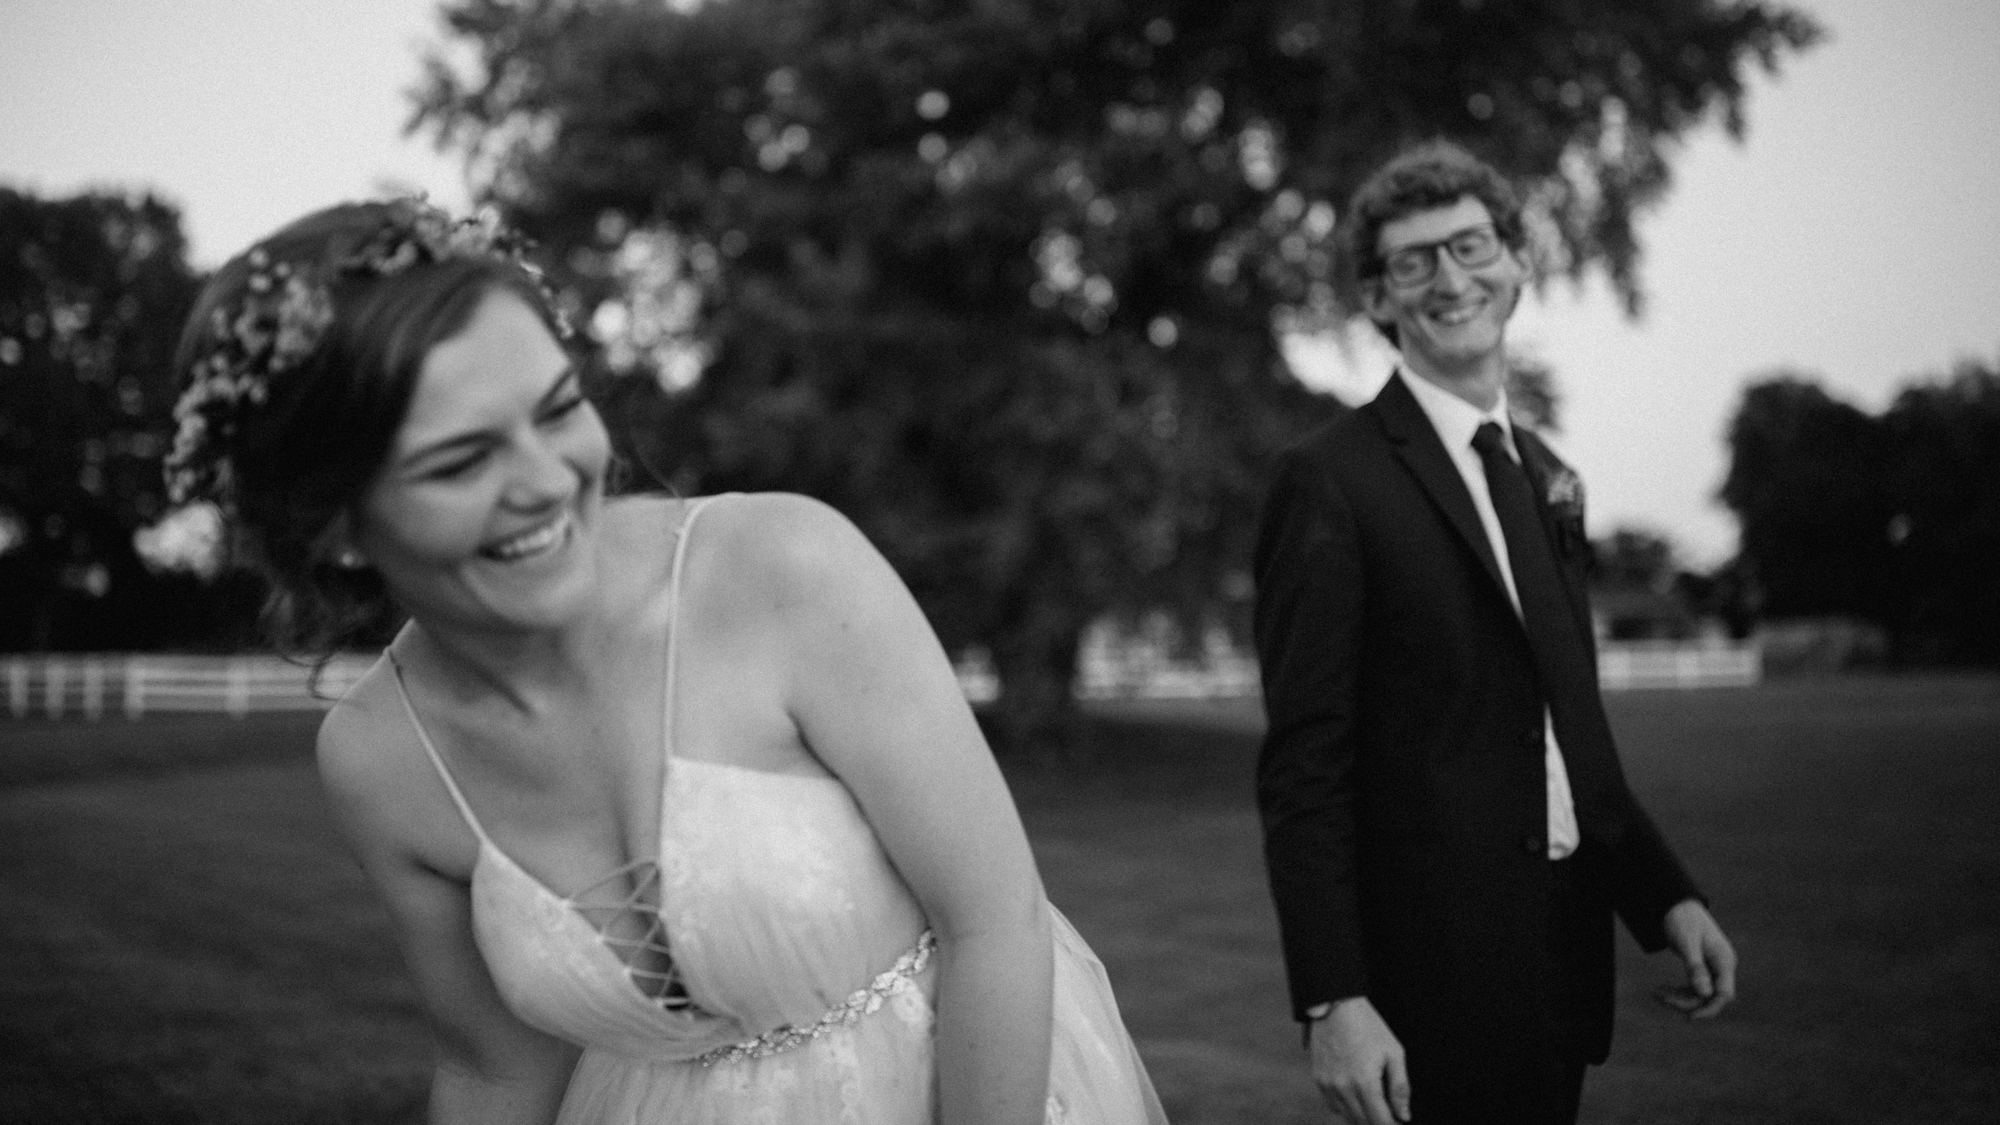 alec_vanderboom_kansas_city_mo_wedding_photos-0067.jpg